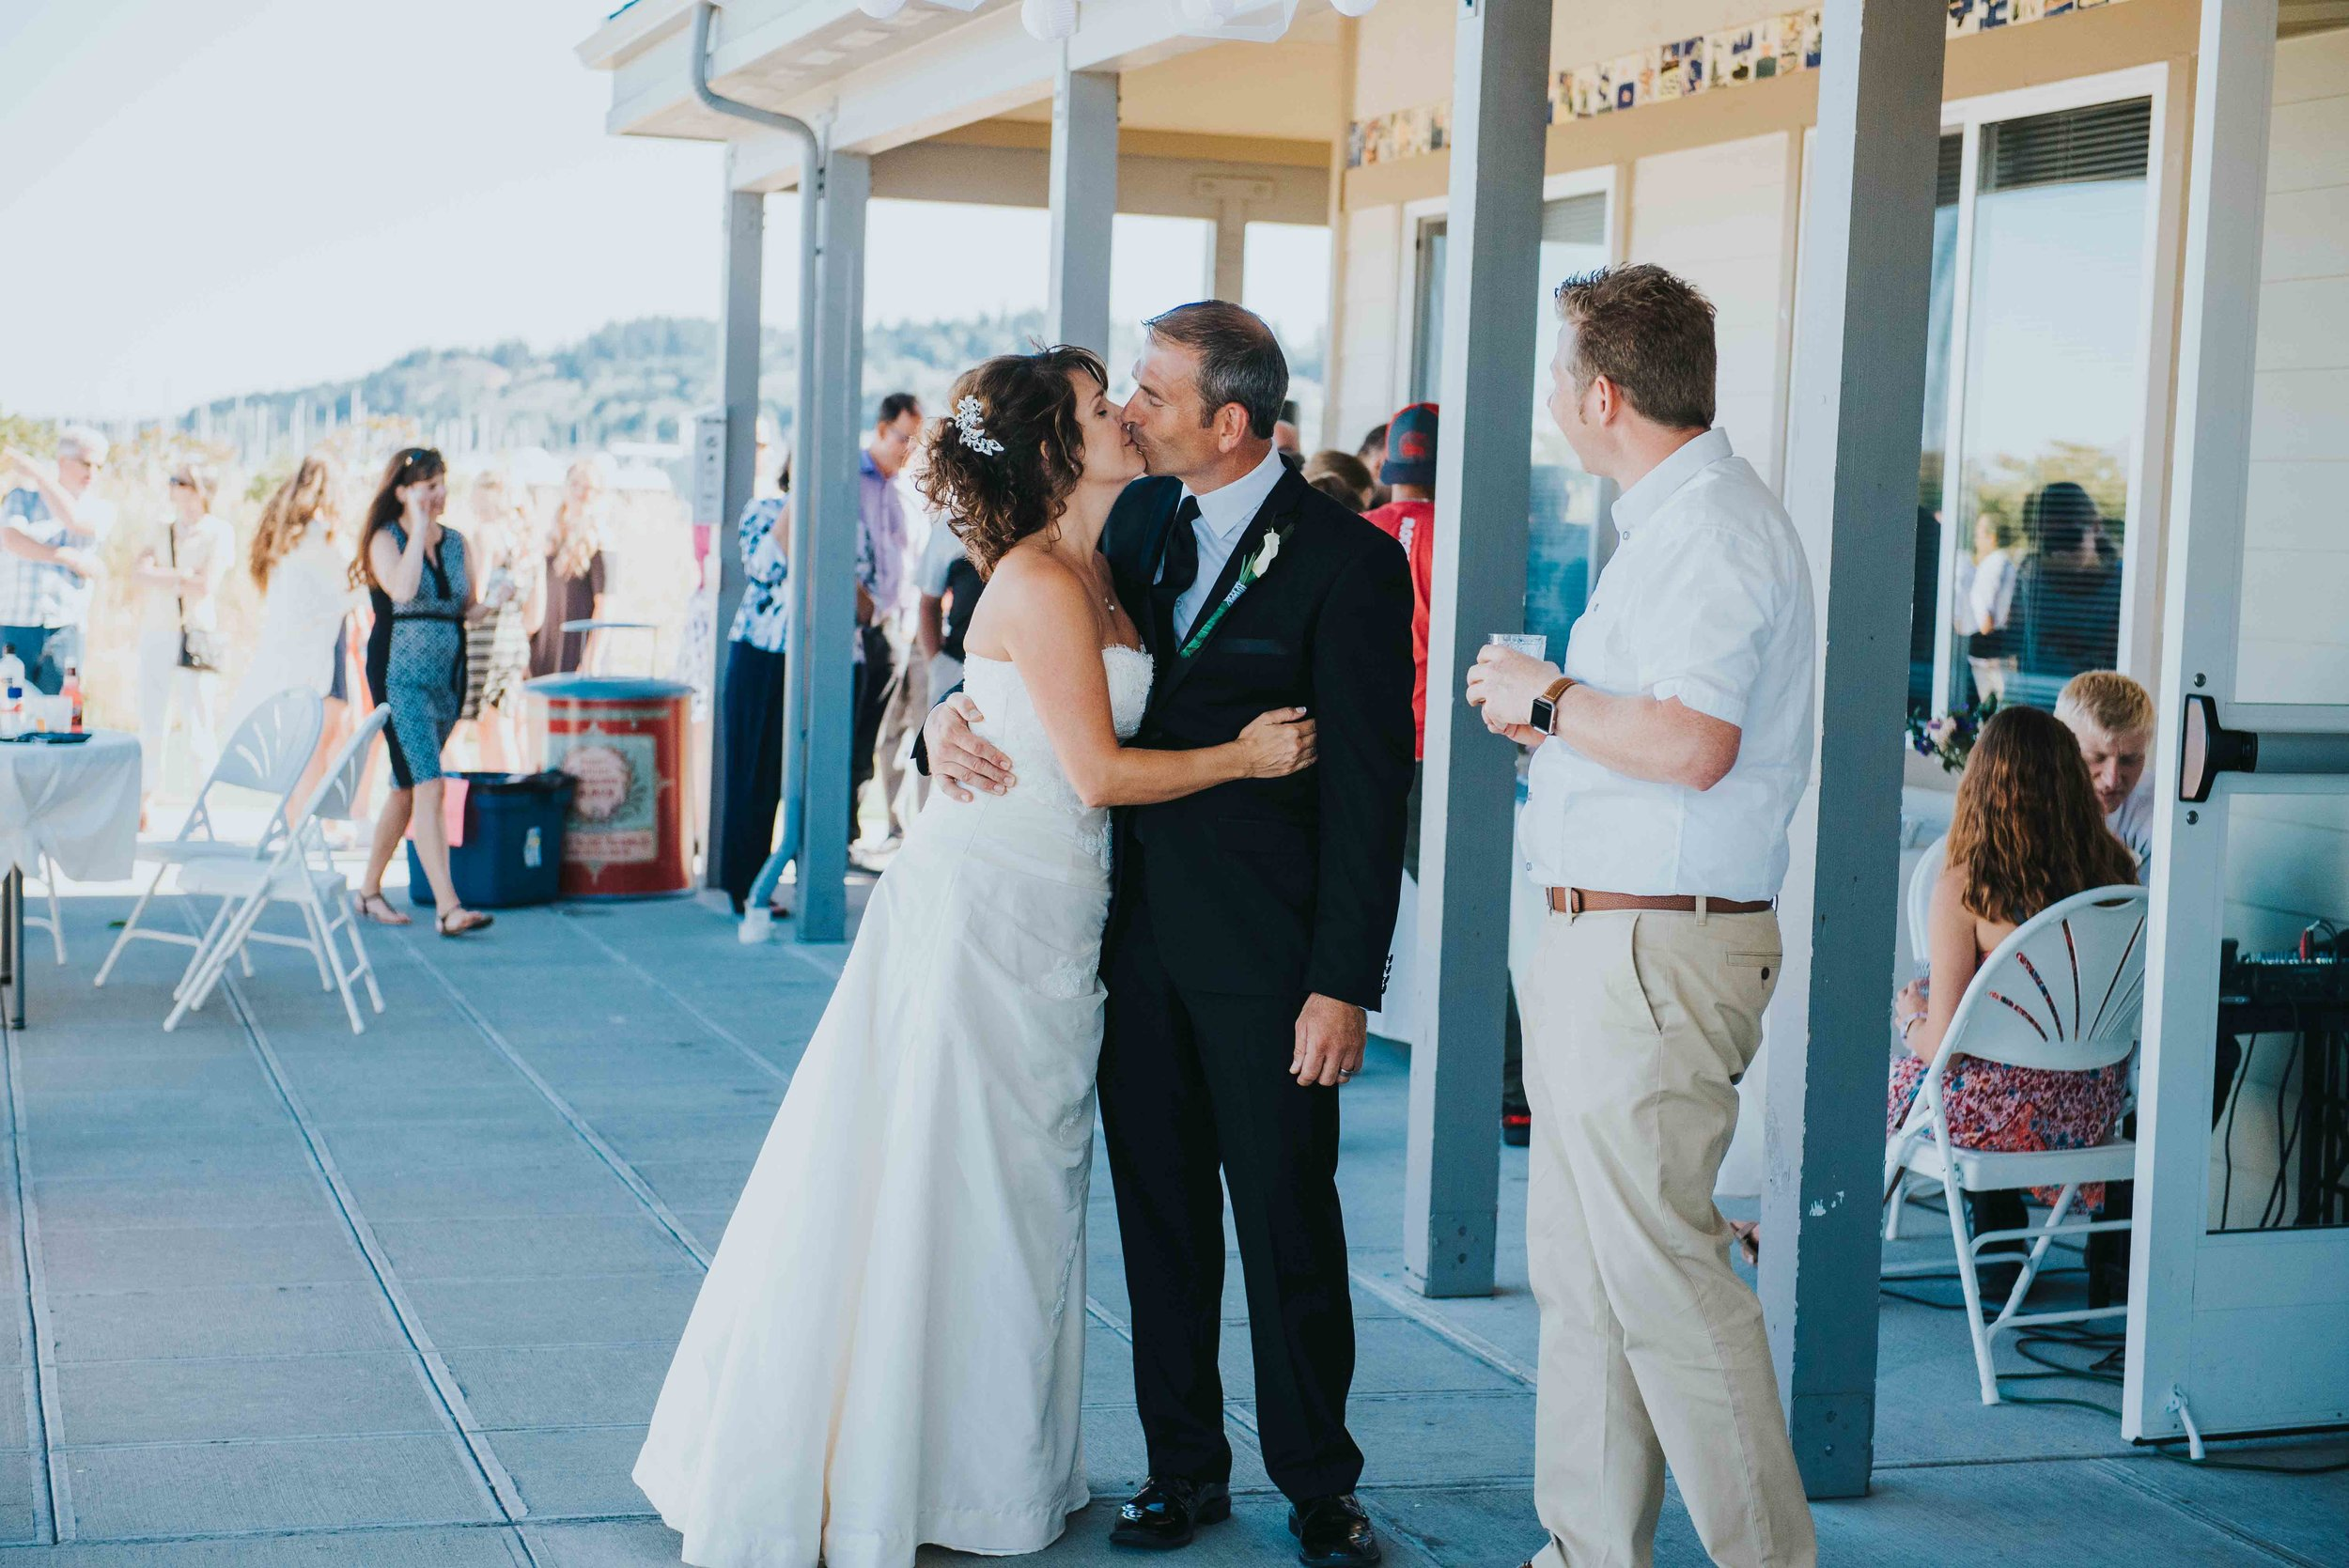 Cap-Sante-Wedding-J-Hodges-Anacortes-52.jpg